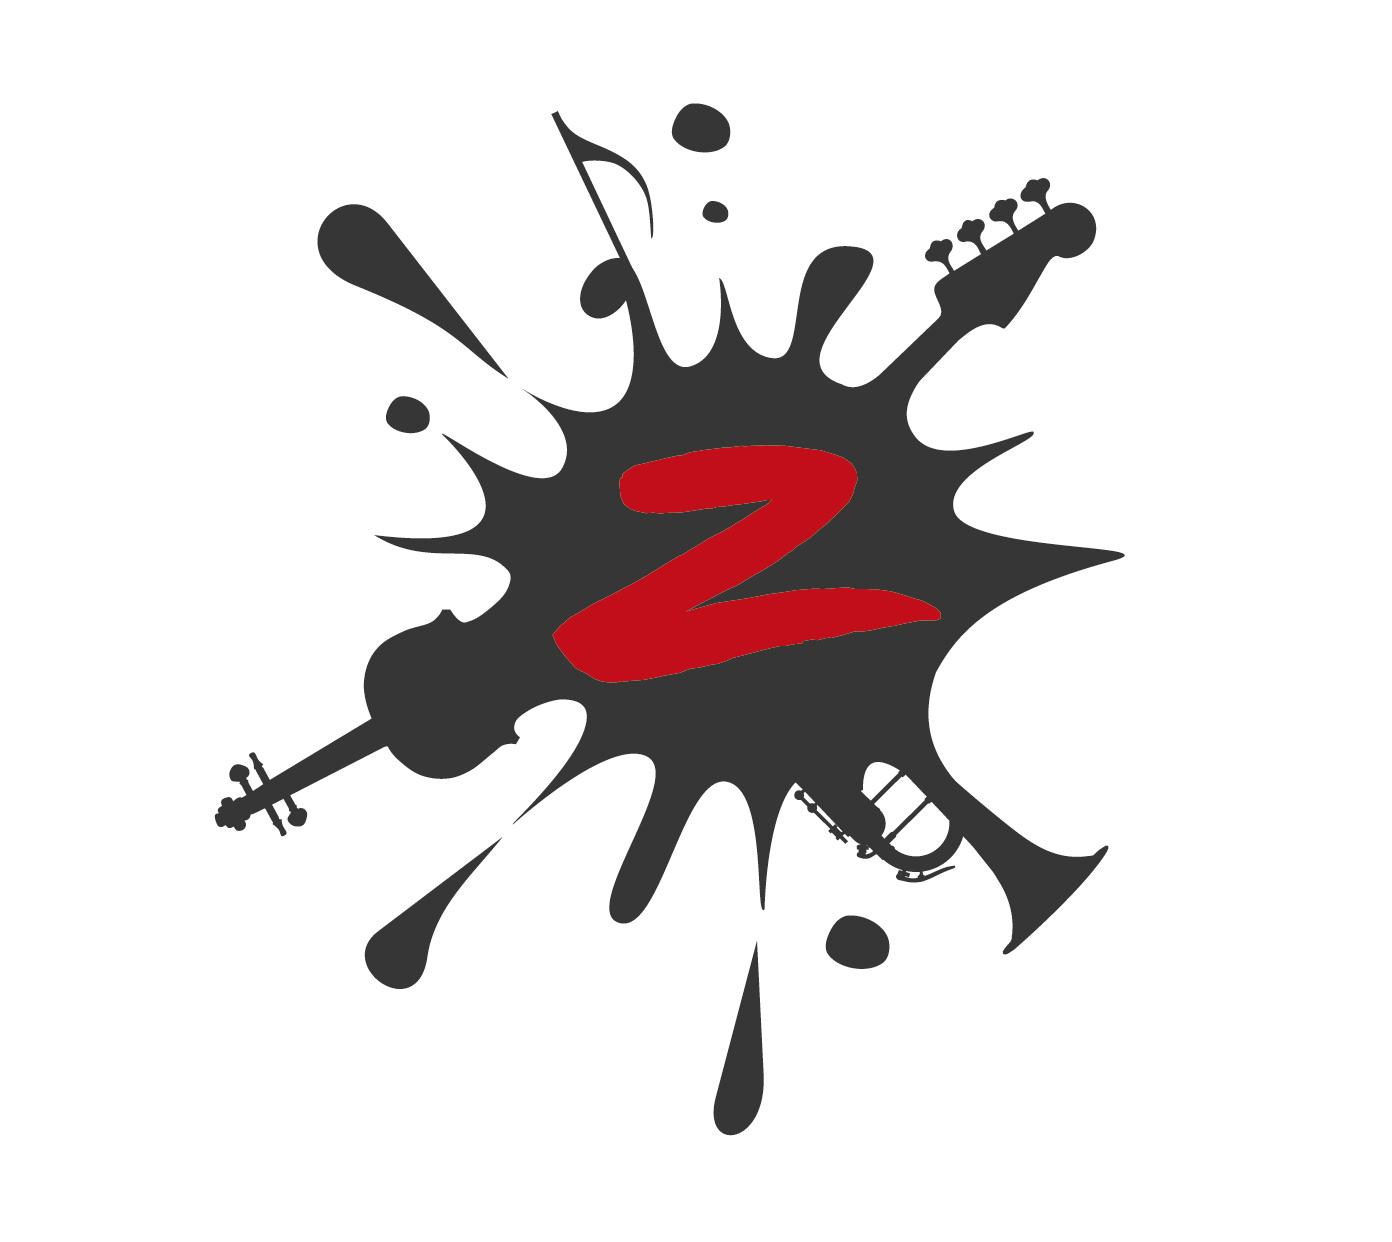 Návrh loga klubu Zetko Kolín